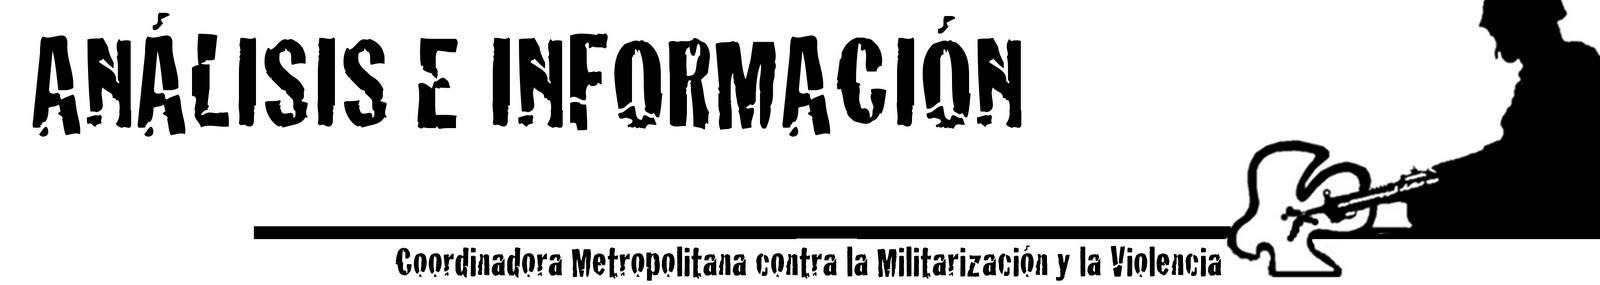 Archivo COMECOM